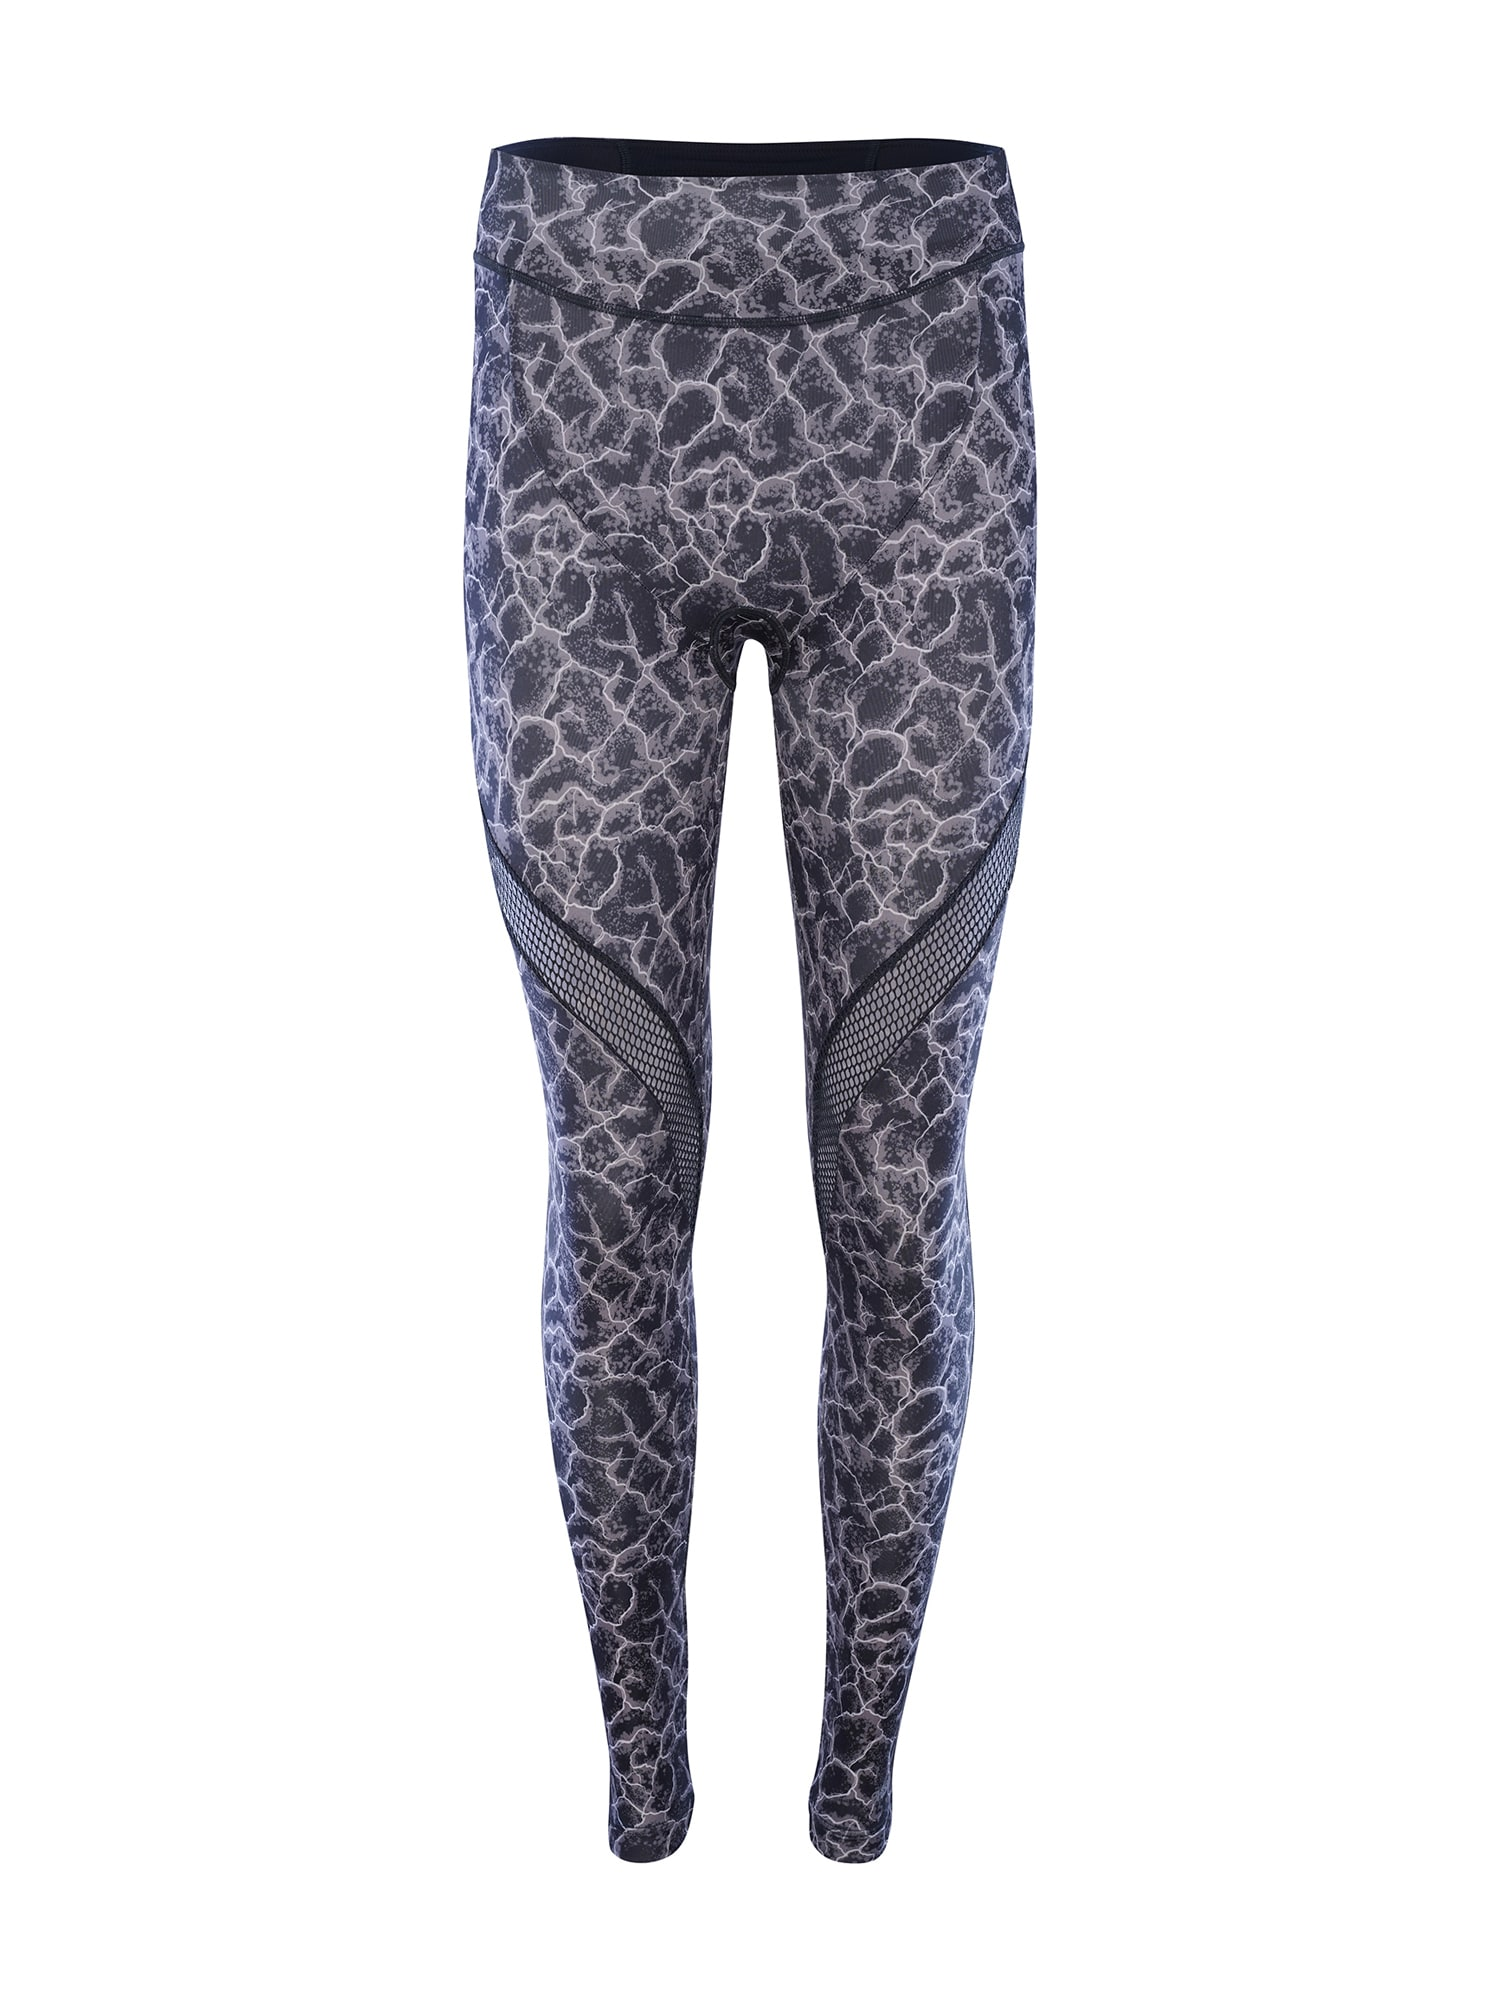 Damen Shock Absorber Sport-Leggings 'Active' grau,  silber, schwarz   03608851645028